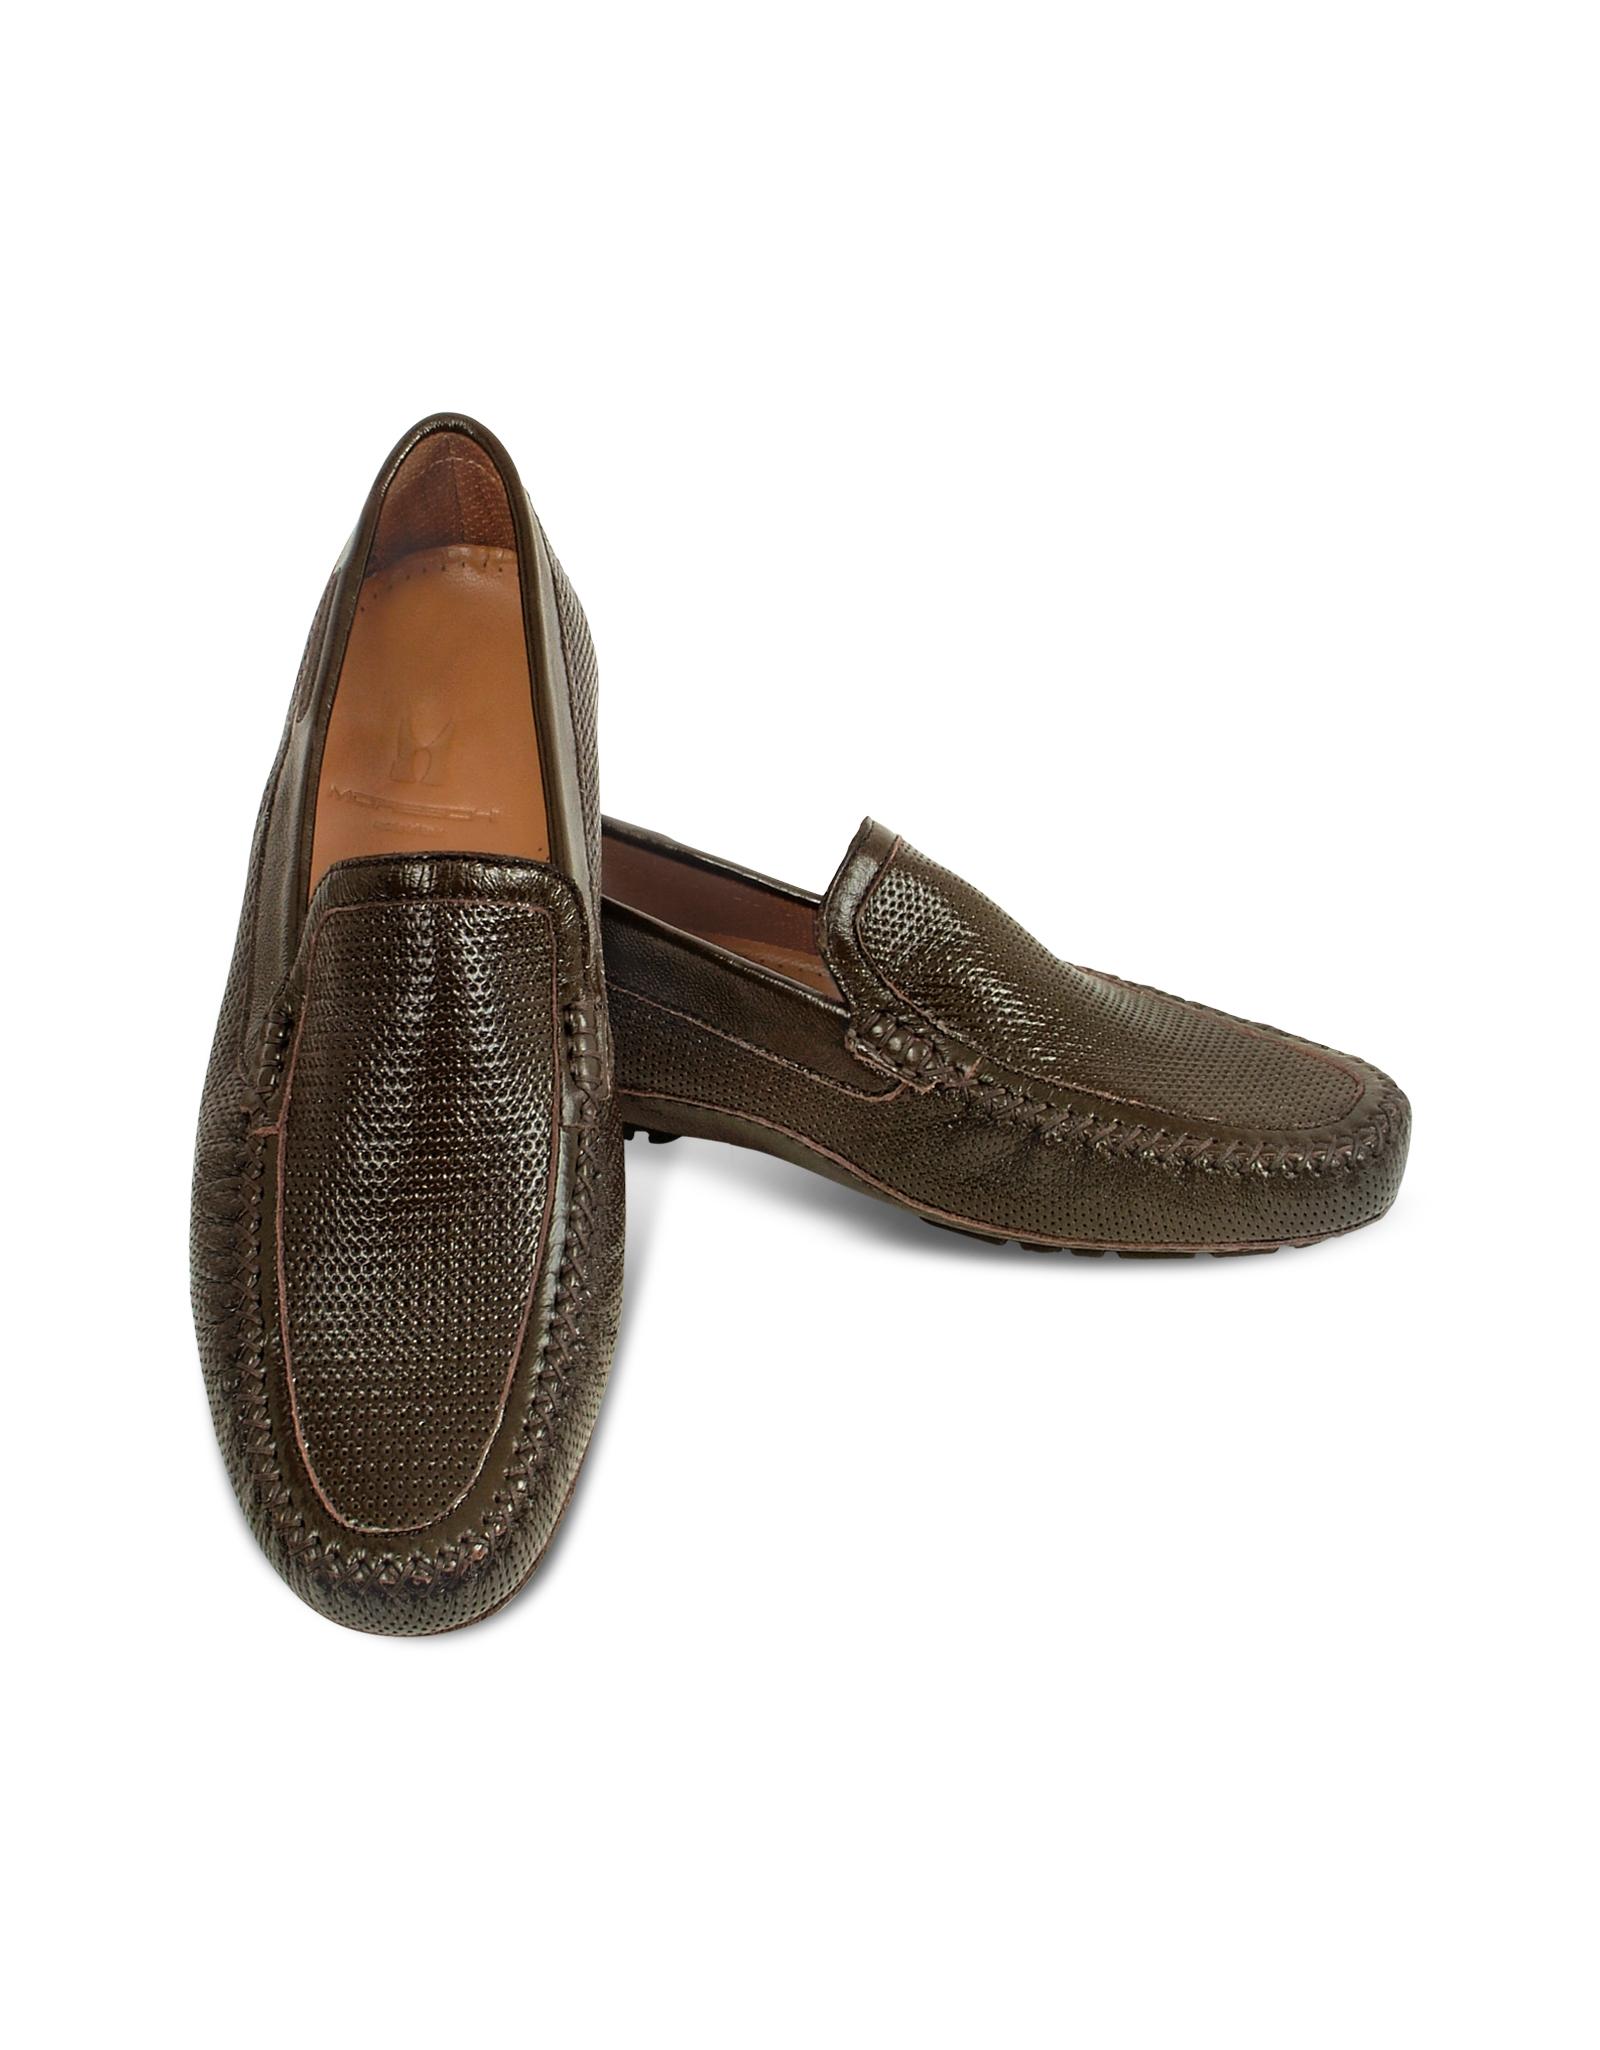 Moreschi Shoes Uk